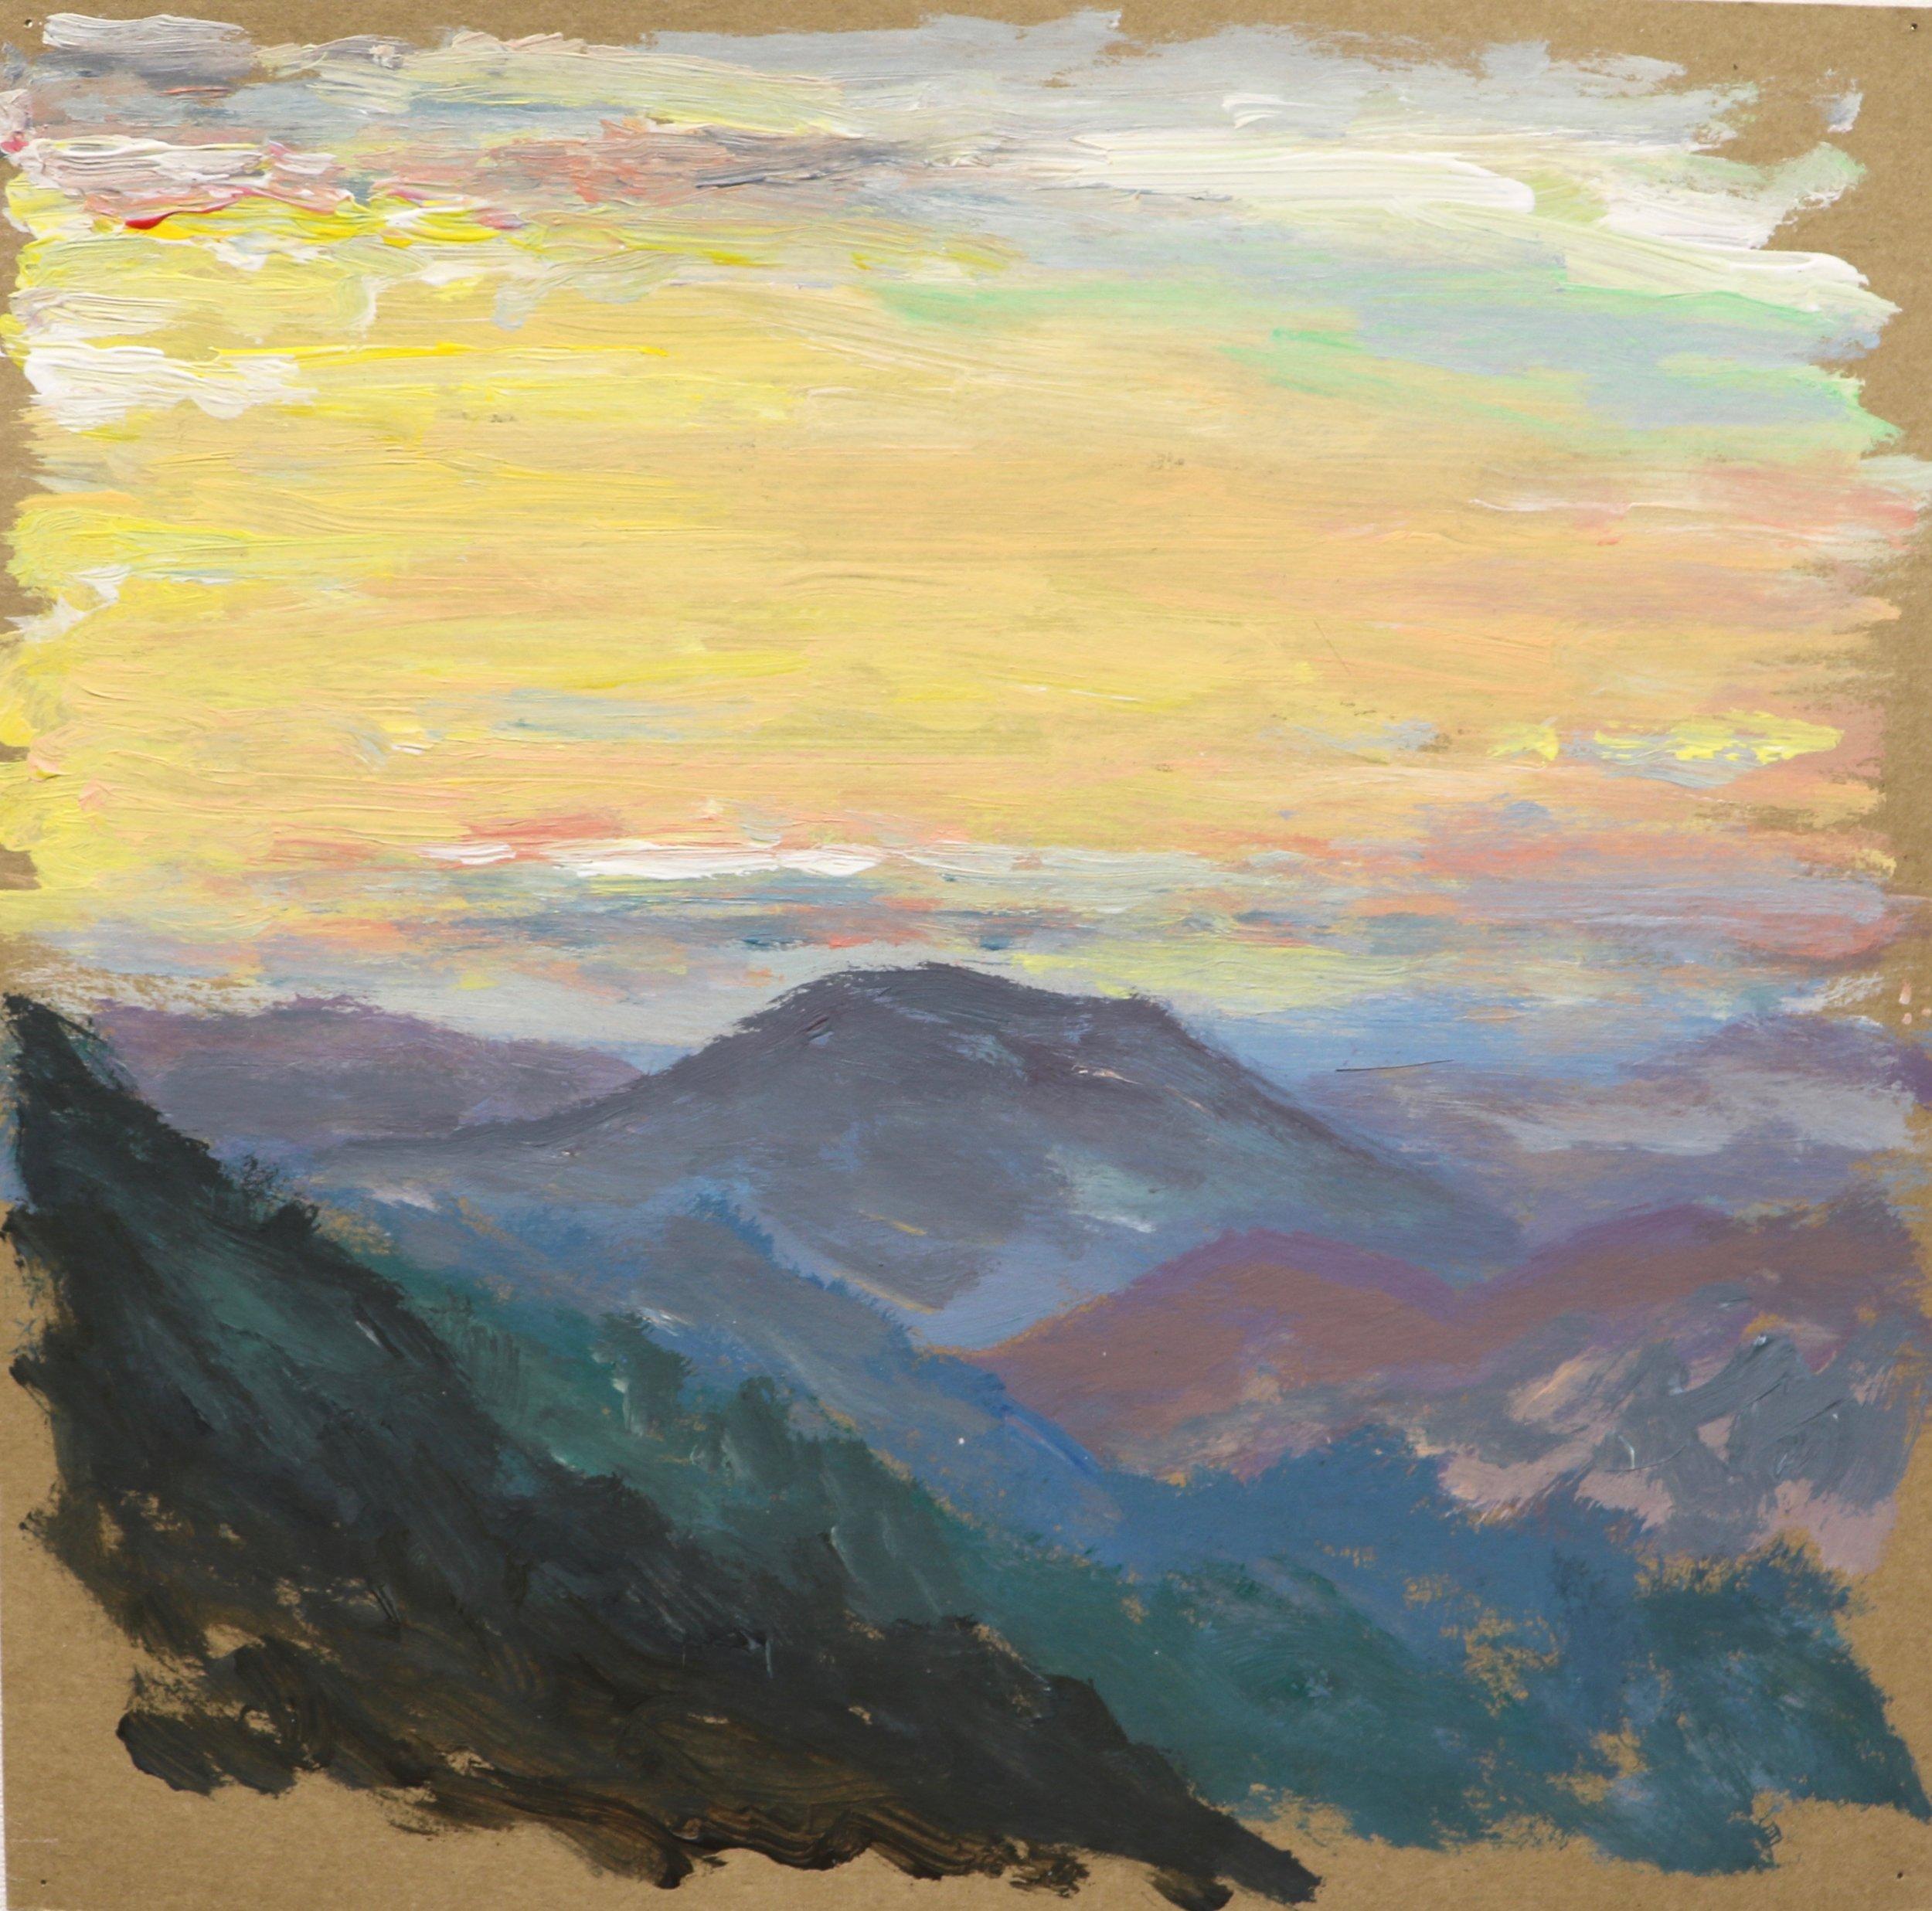 Sunrise, Les Tapies Valley #2